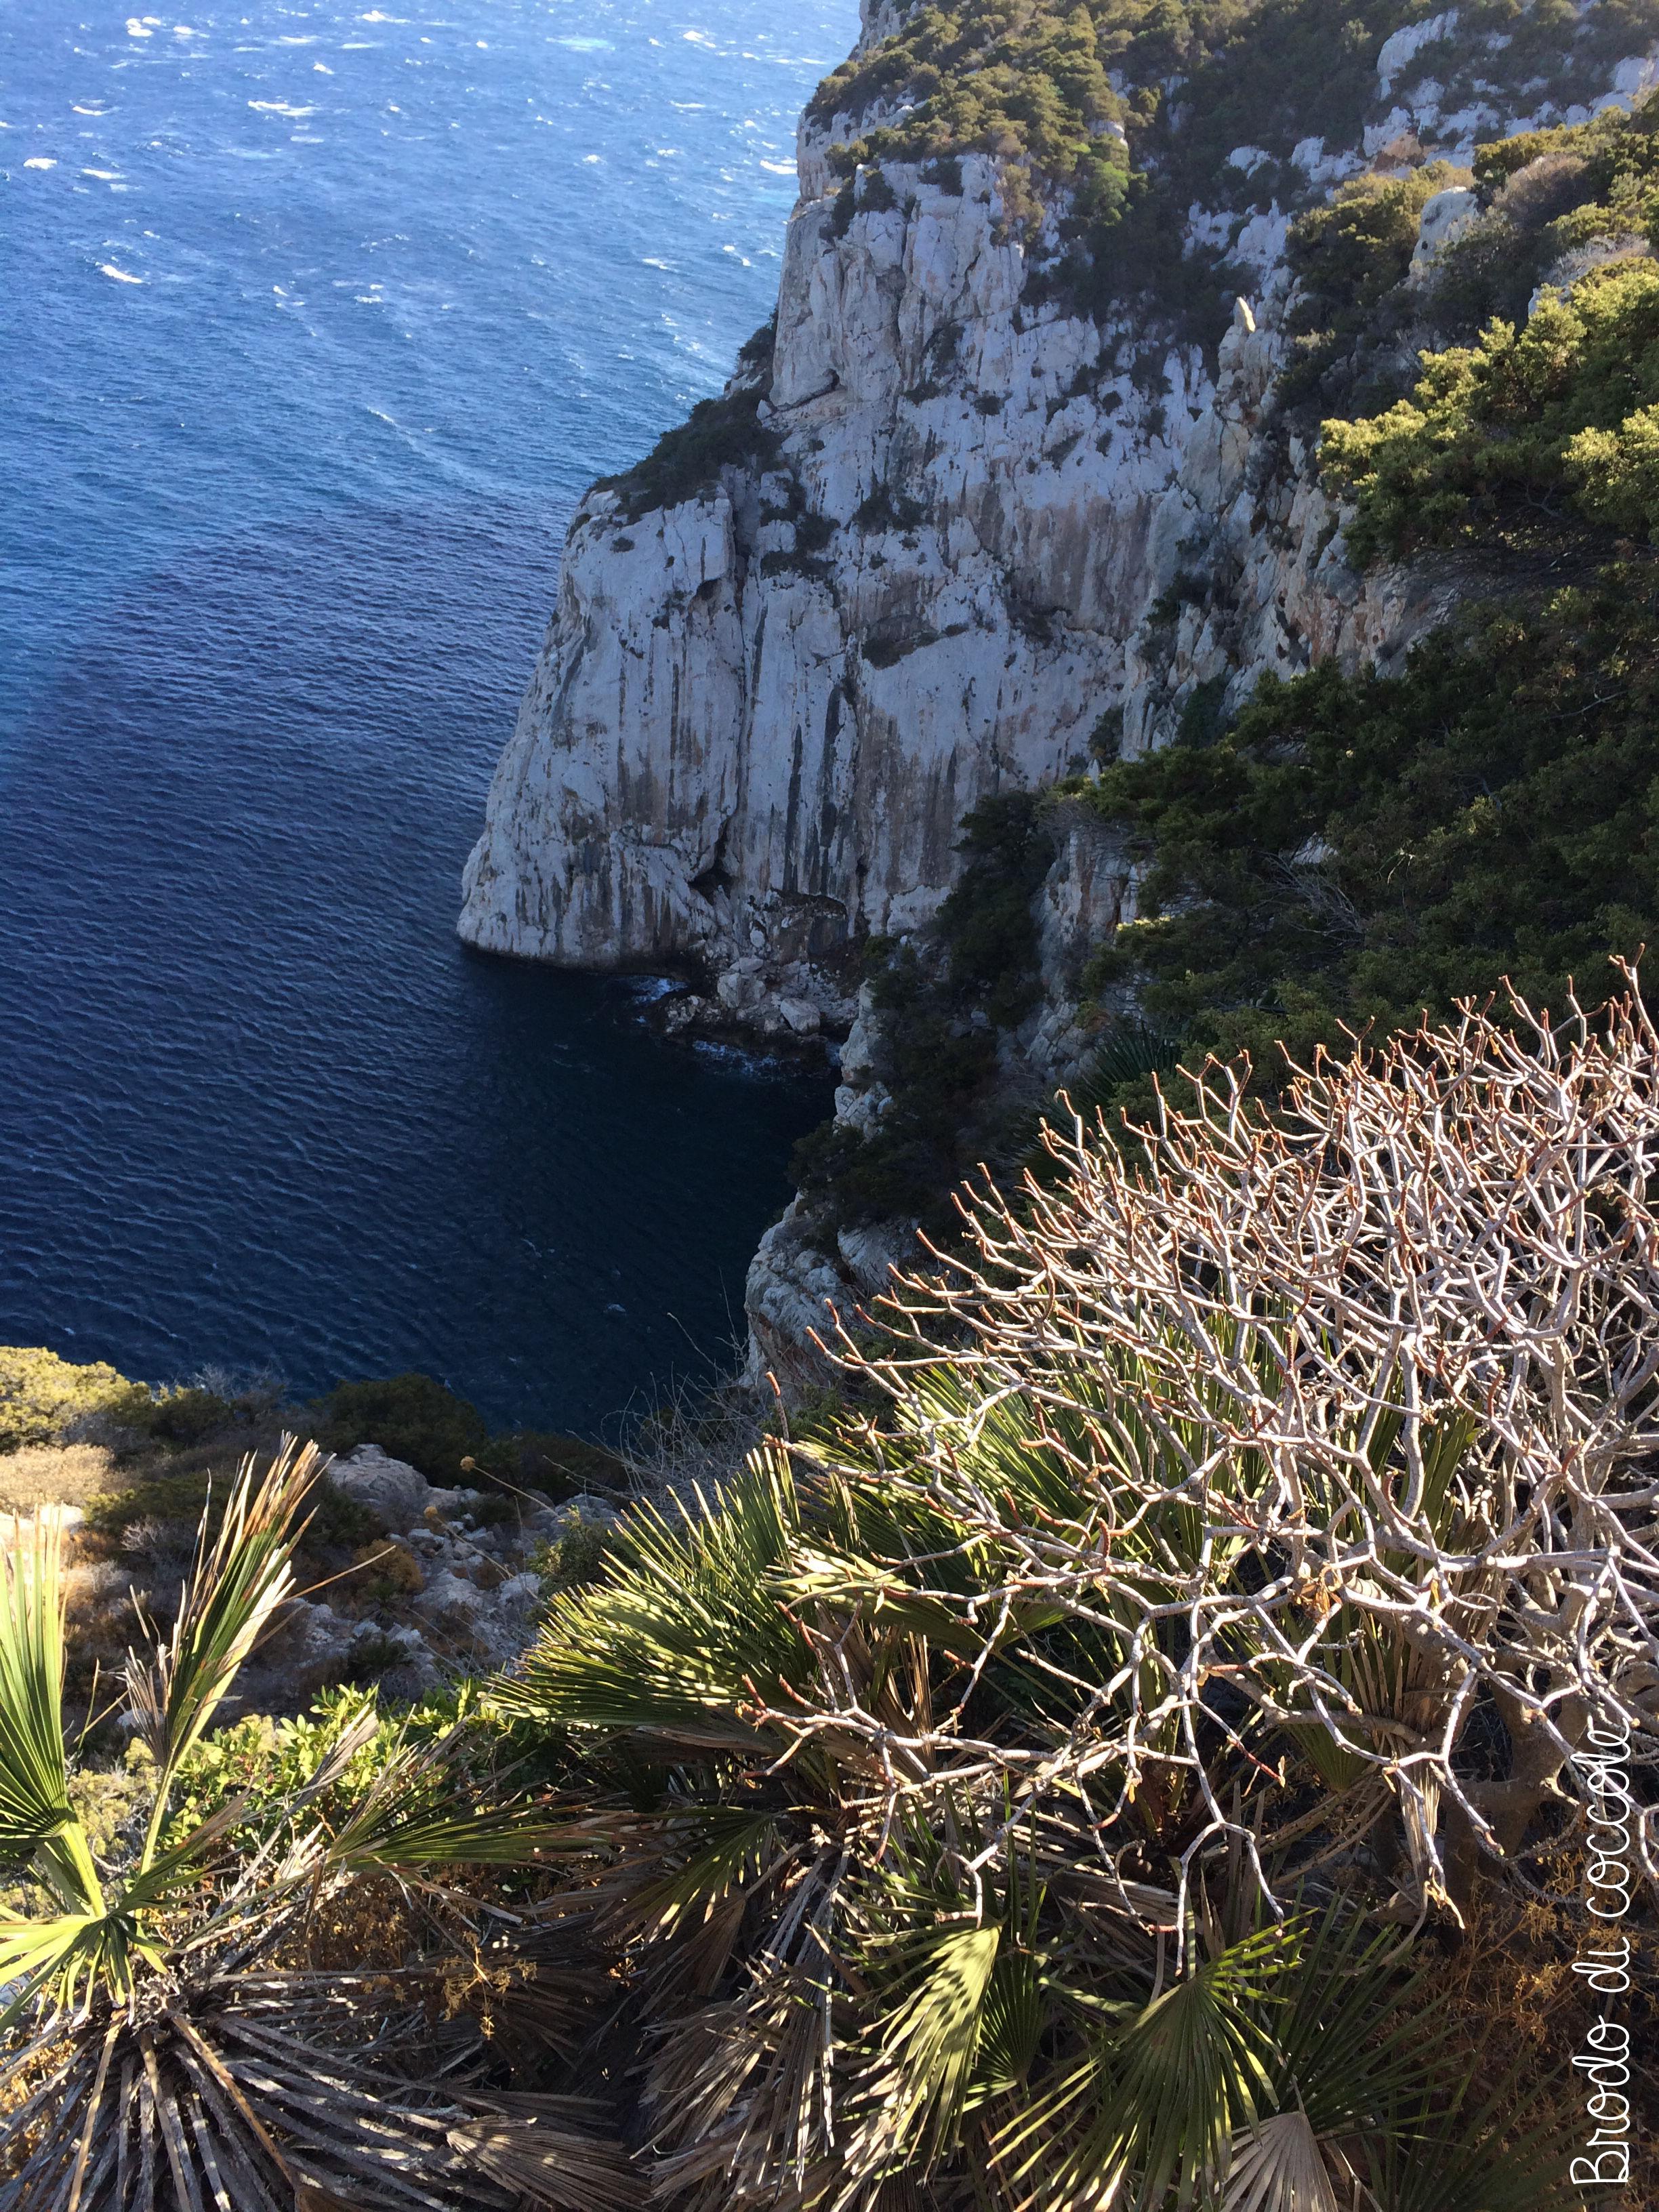 Sardegna - Capo Caccia